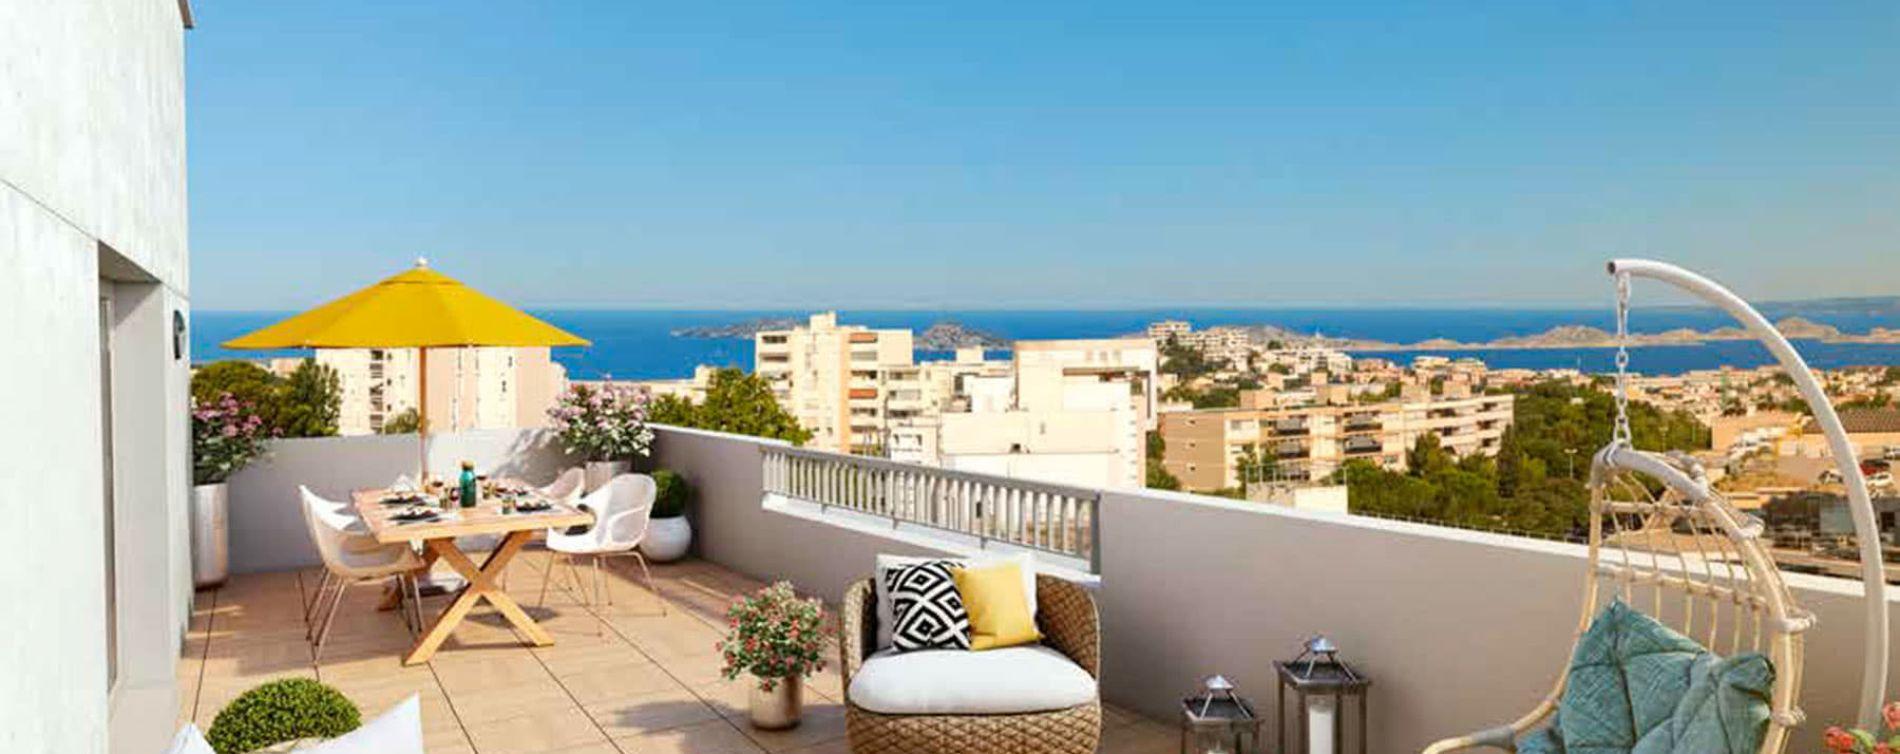 Résidence Panoramik à Marseille